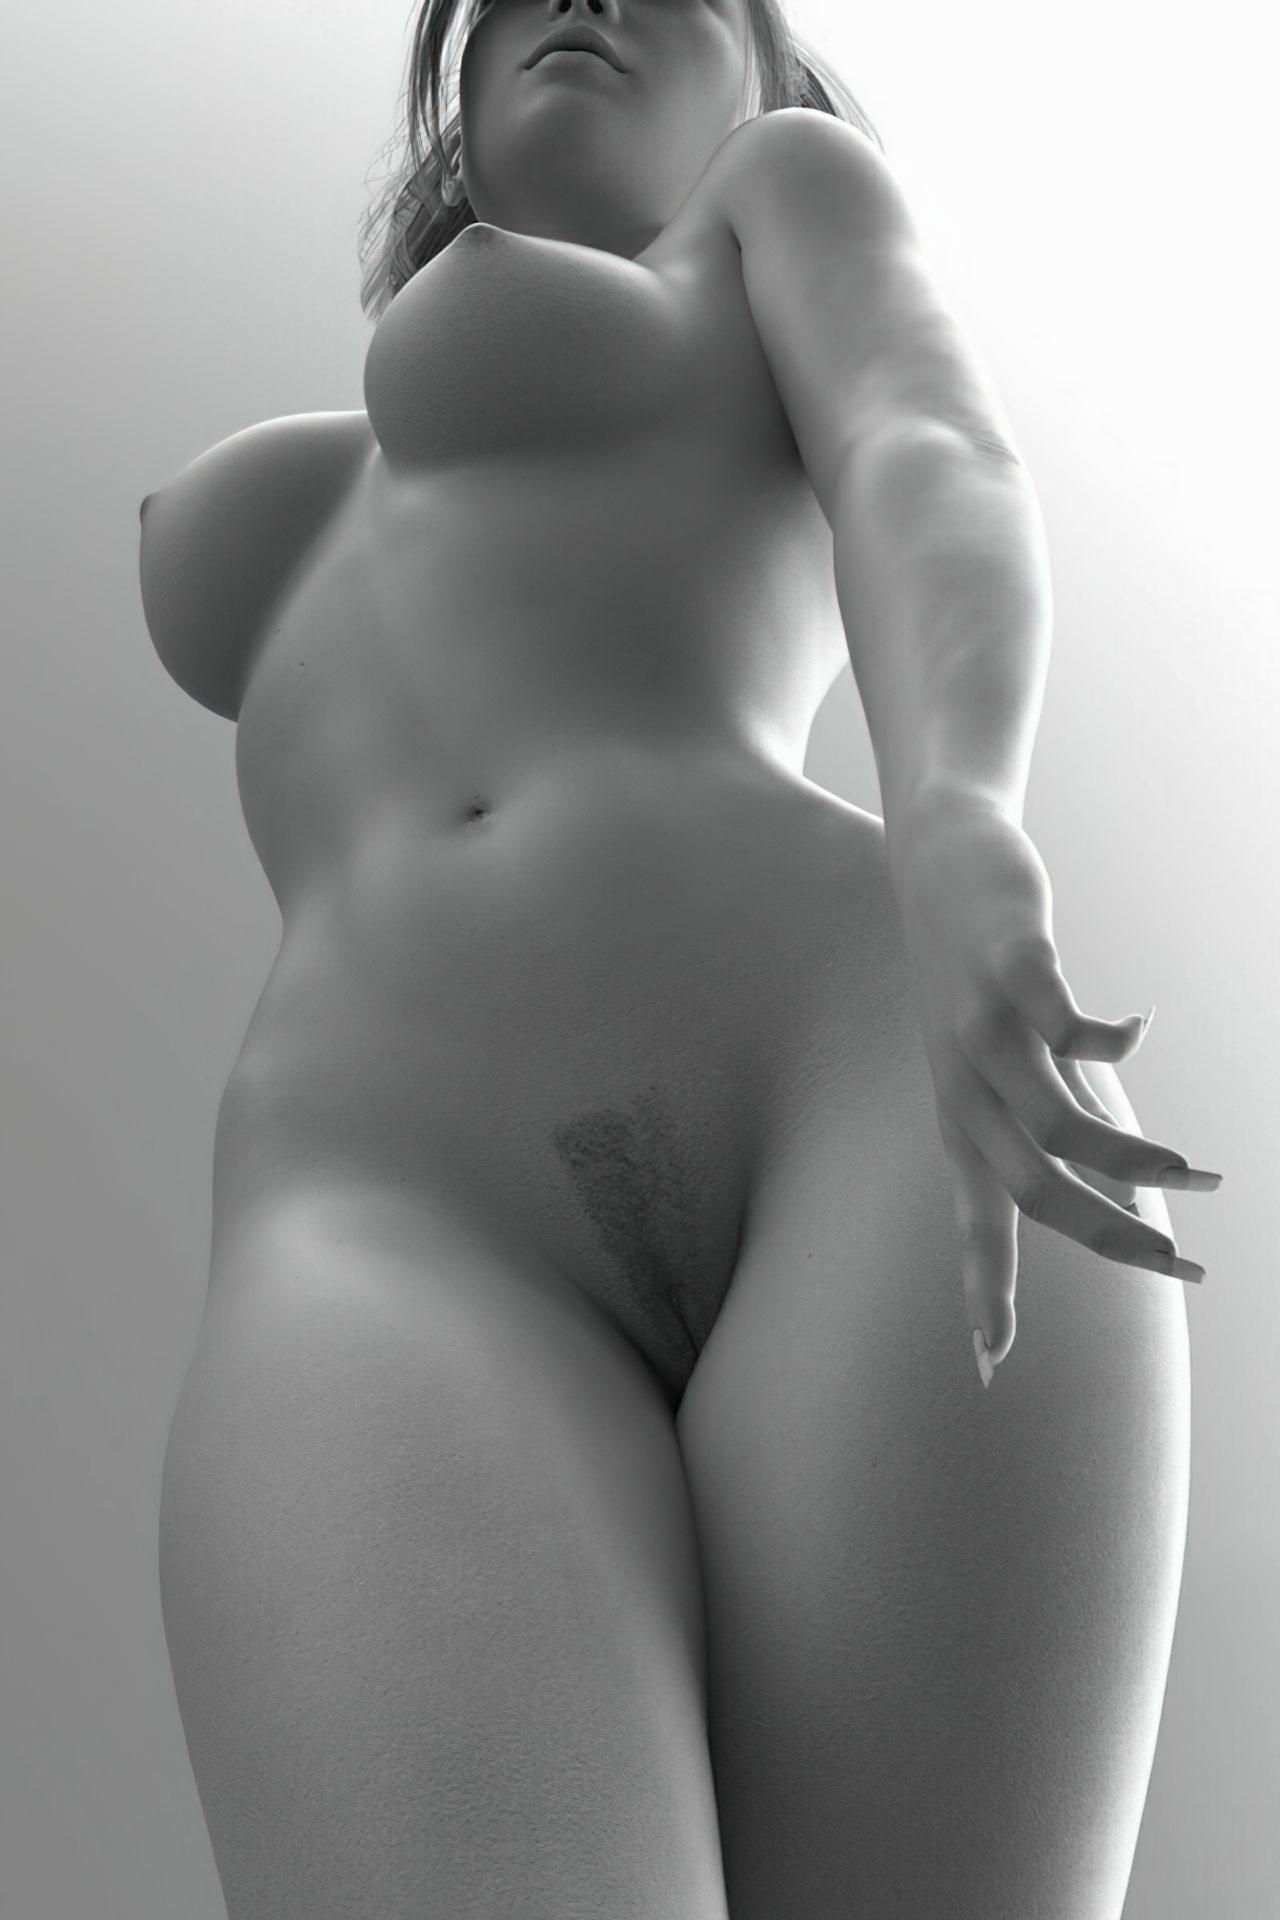 Fotos de Mulheres (45)